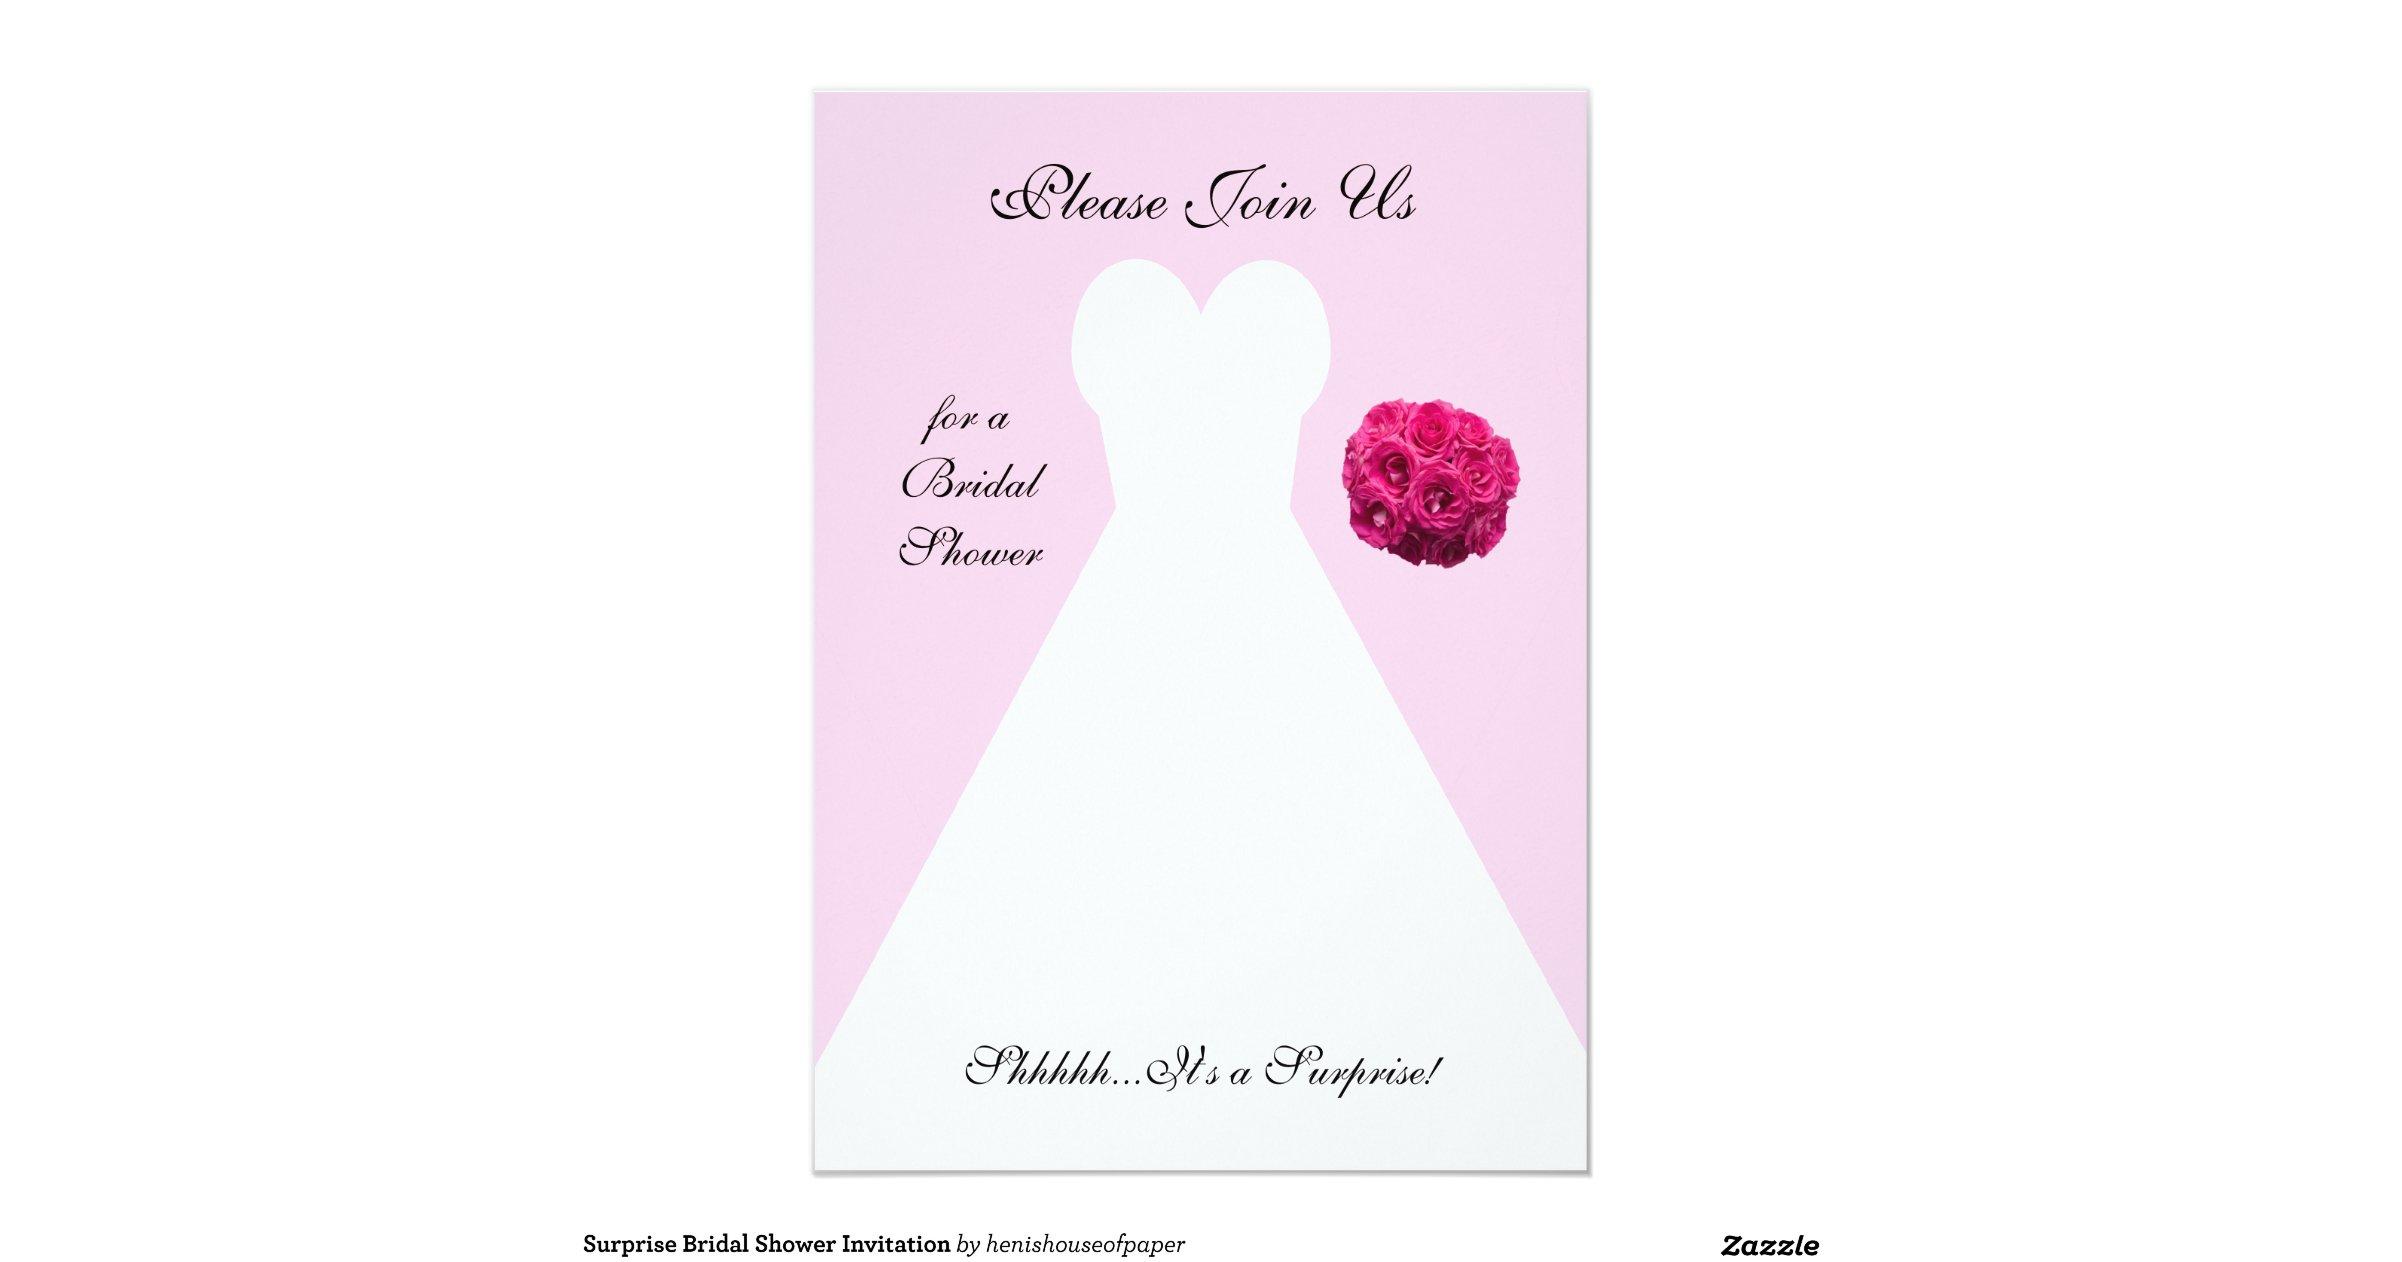 Surprise Wedding Shower Invitations - Locallygrownweddings.com